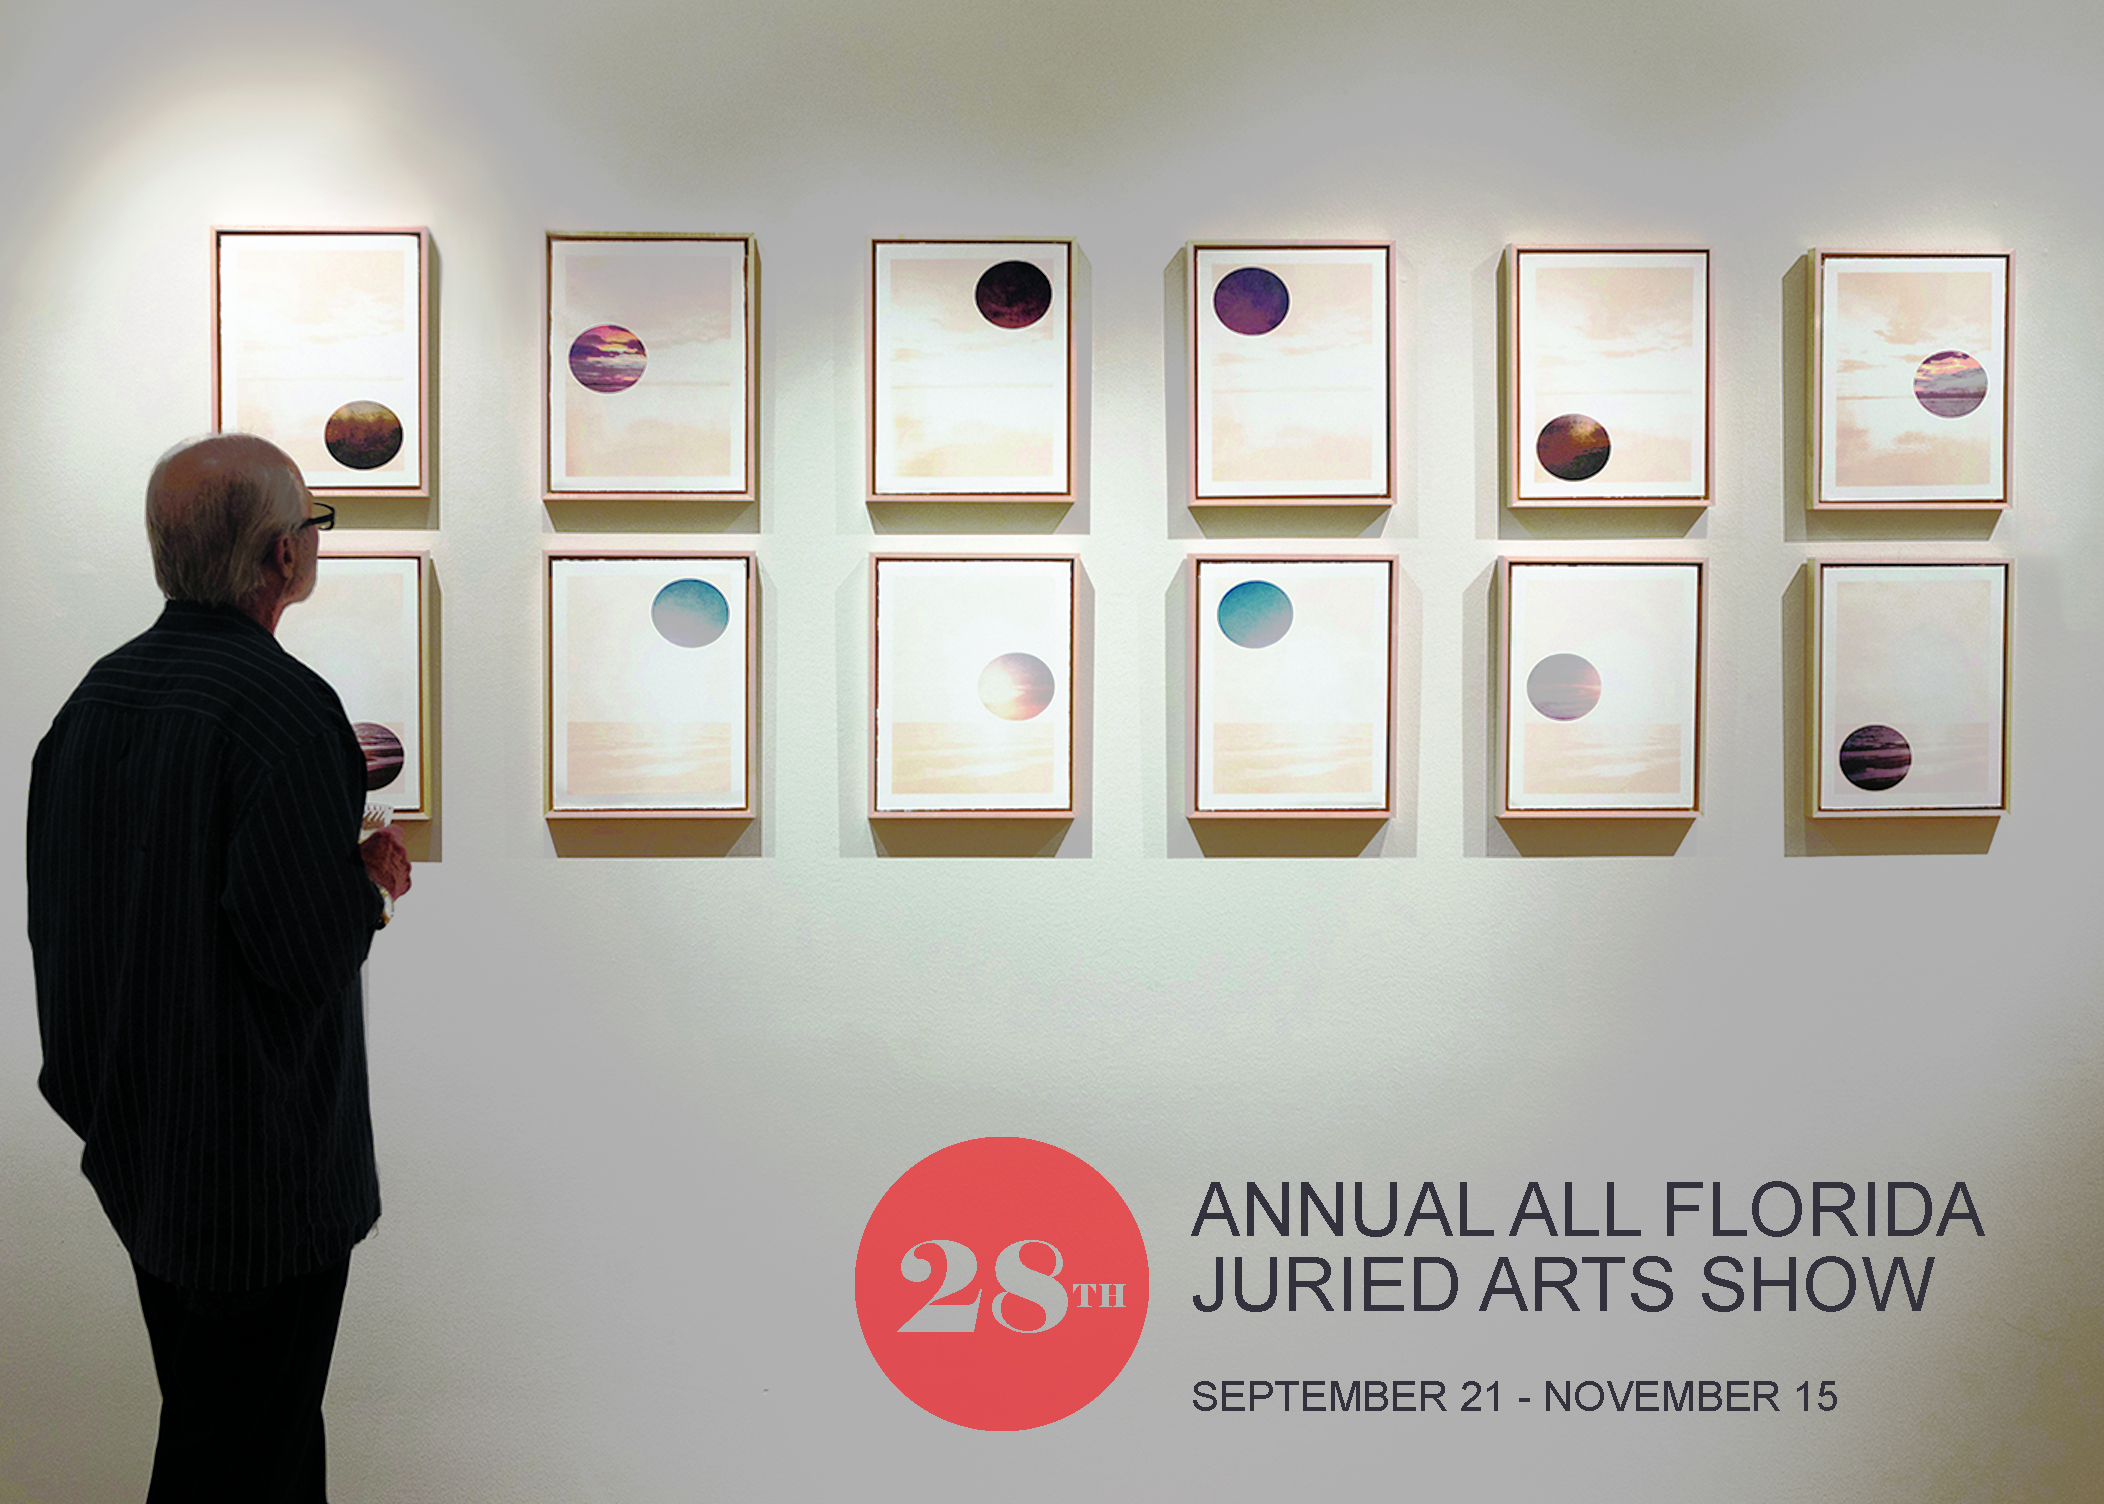 28th Annual All Florida Juried Arts Show